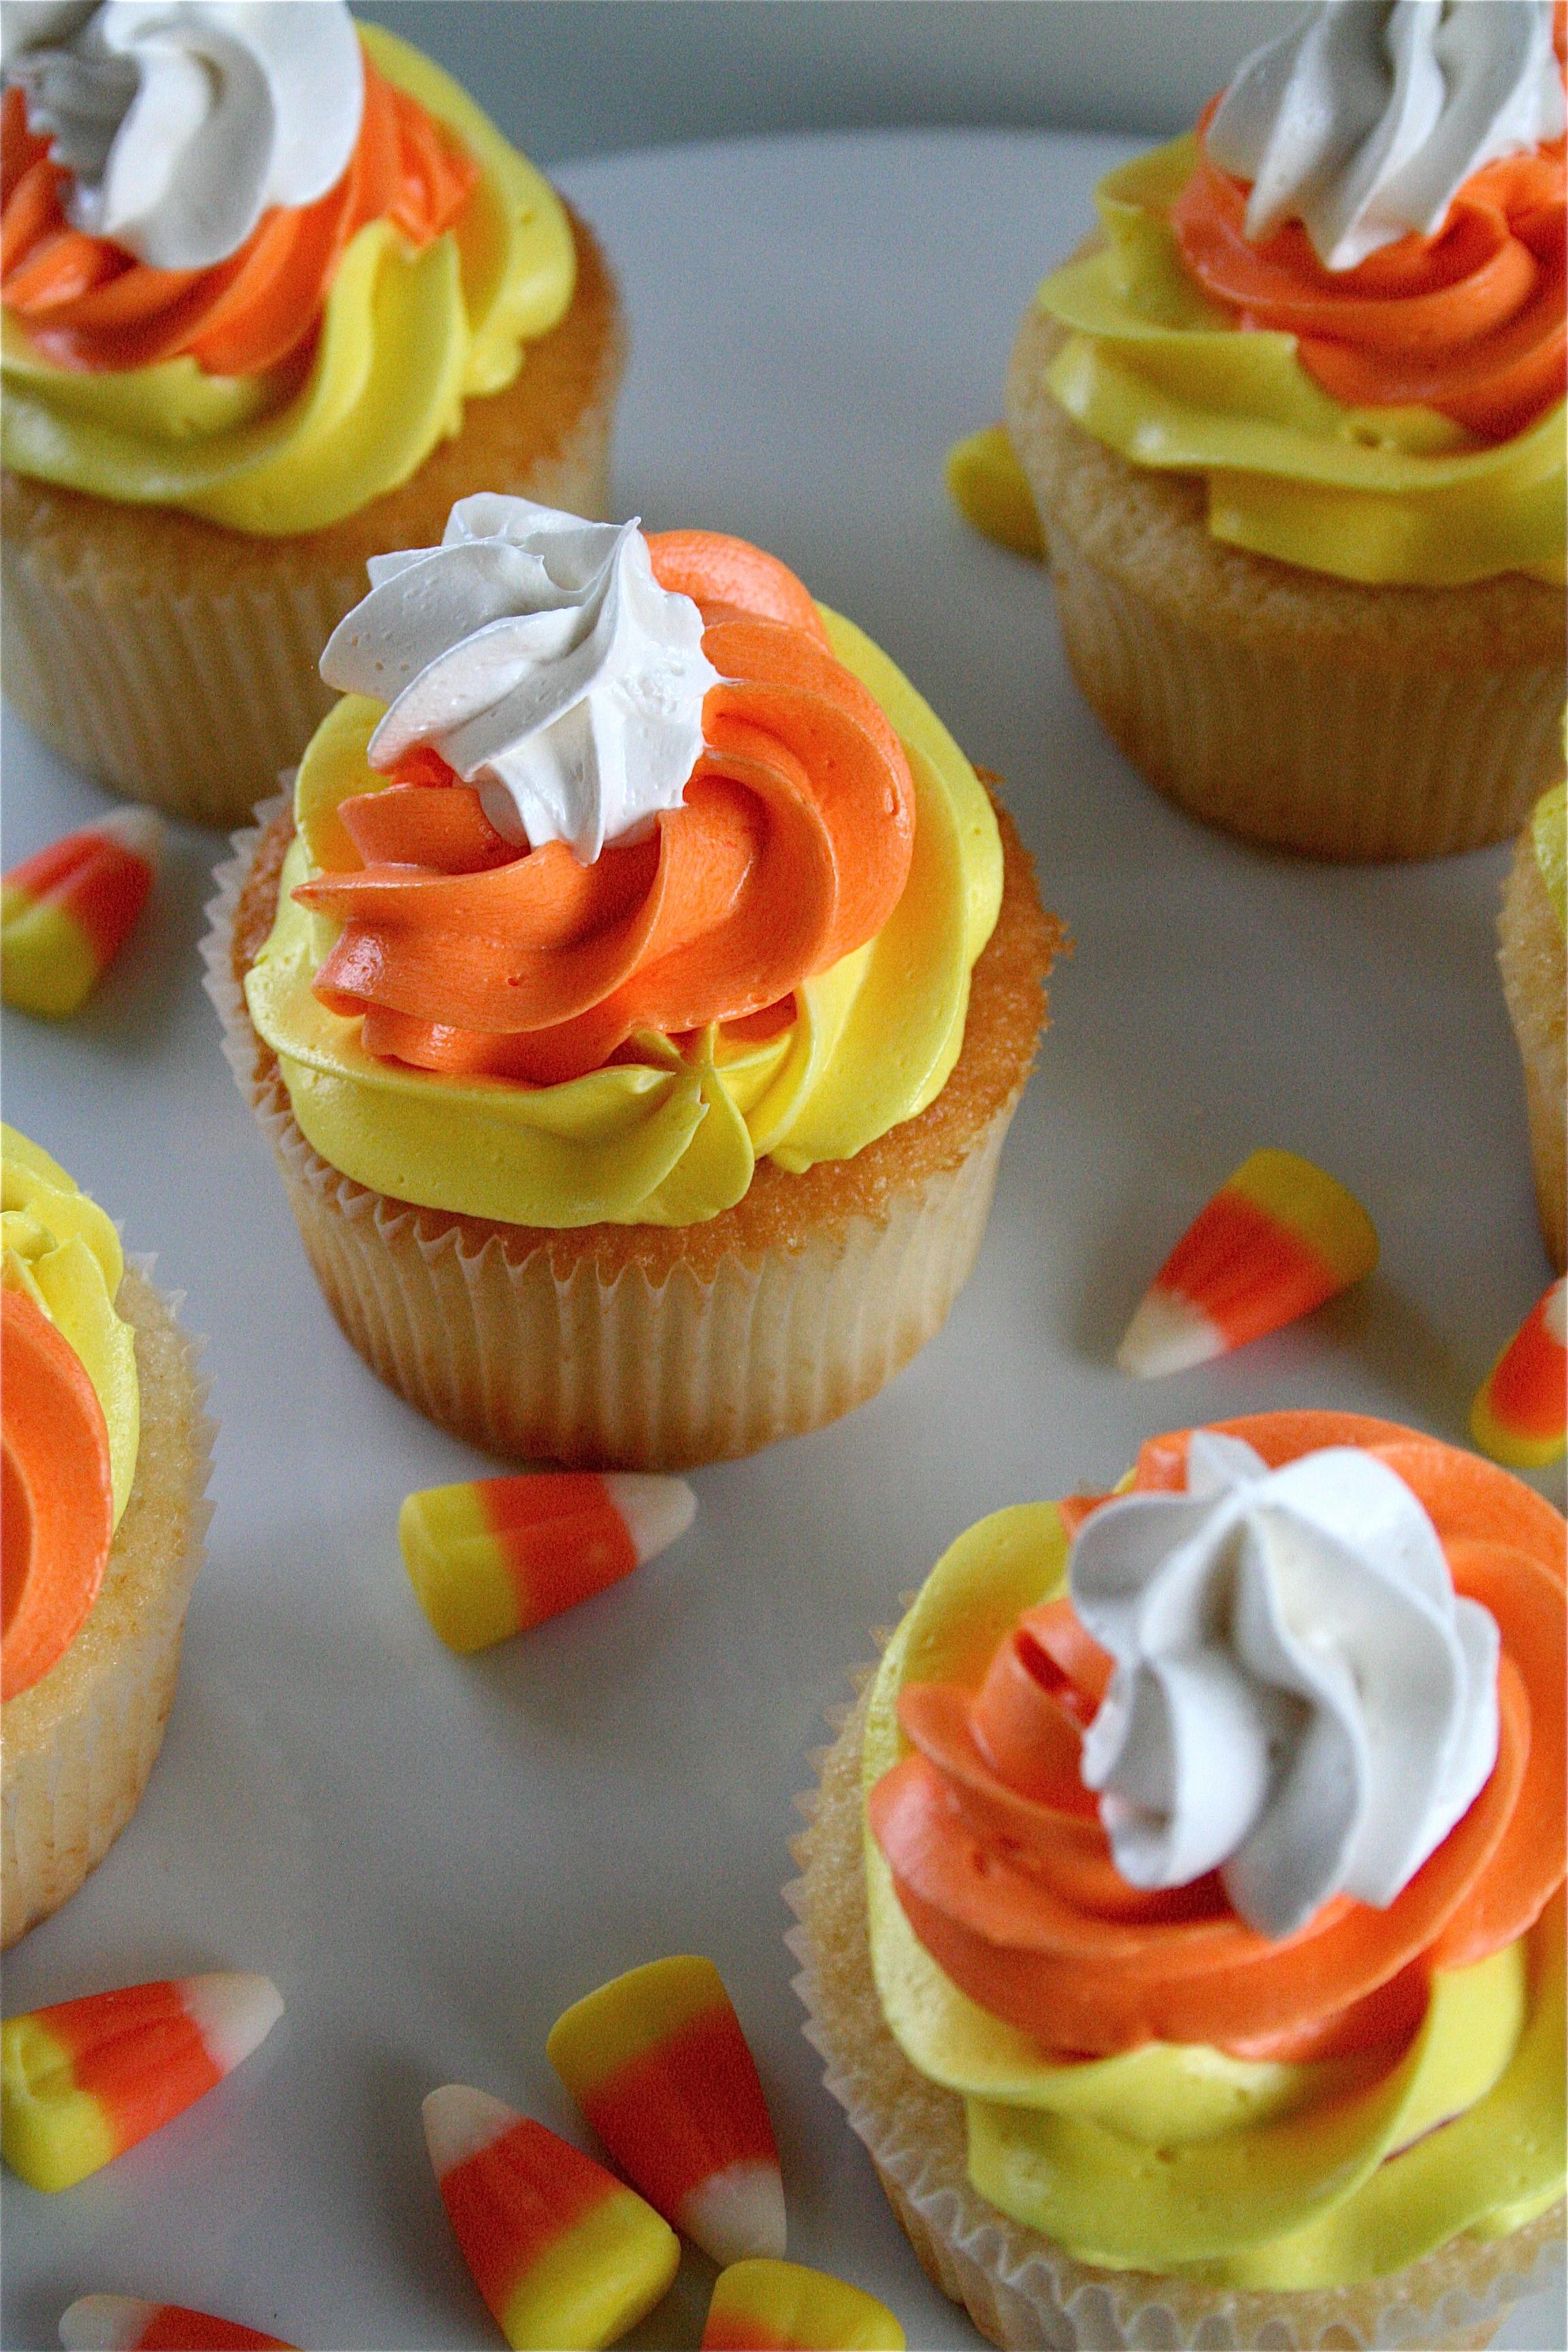 Homemade Halloween Cupcakes  28 Cute Halloween Cupcakes Easy Recipes for Halloween